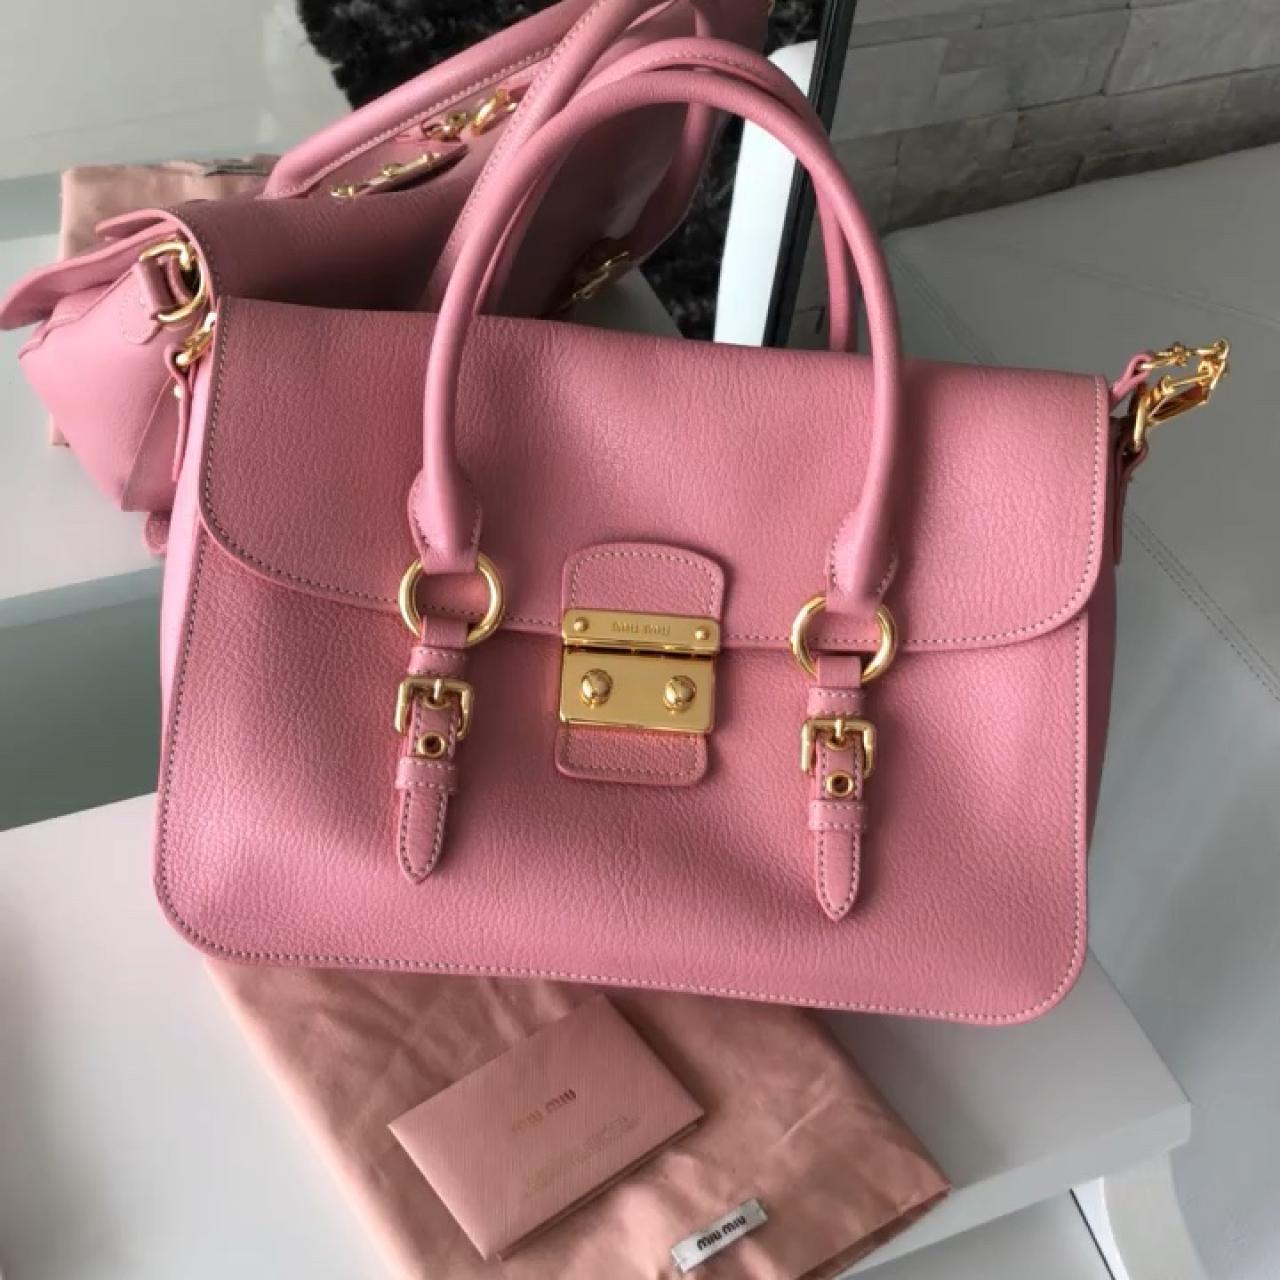 3e09431731da MIU MIU Pink leather top handle bag. GHW. Comes with strap. - Depop